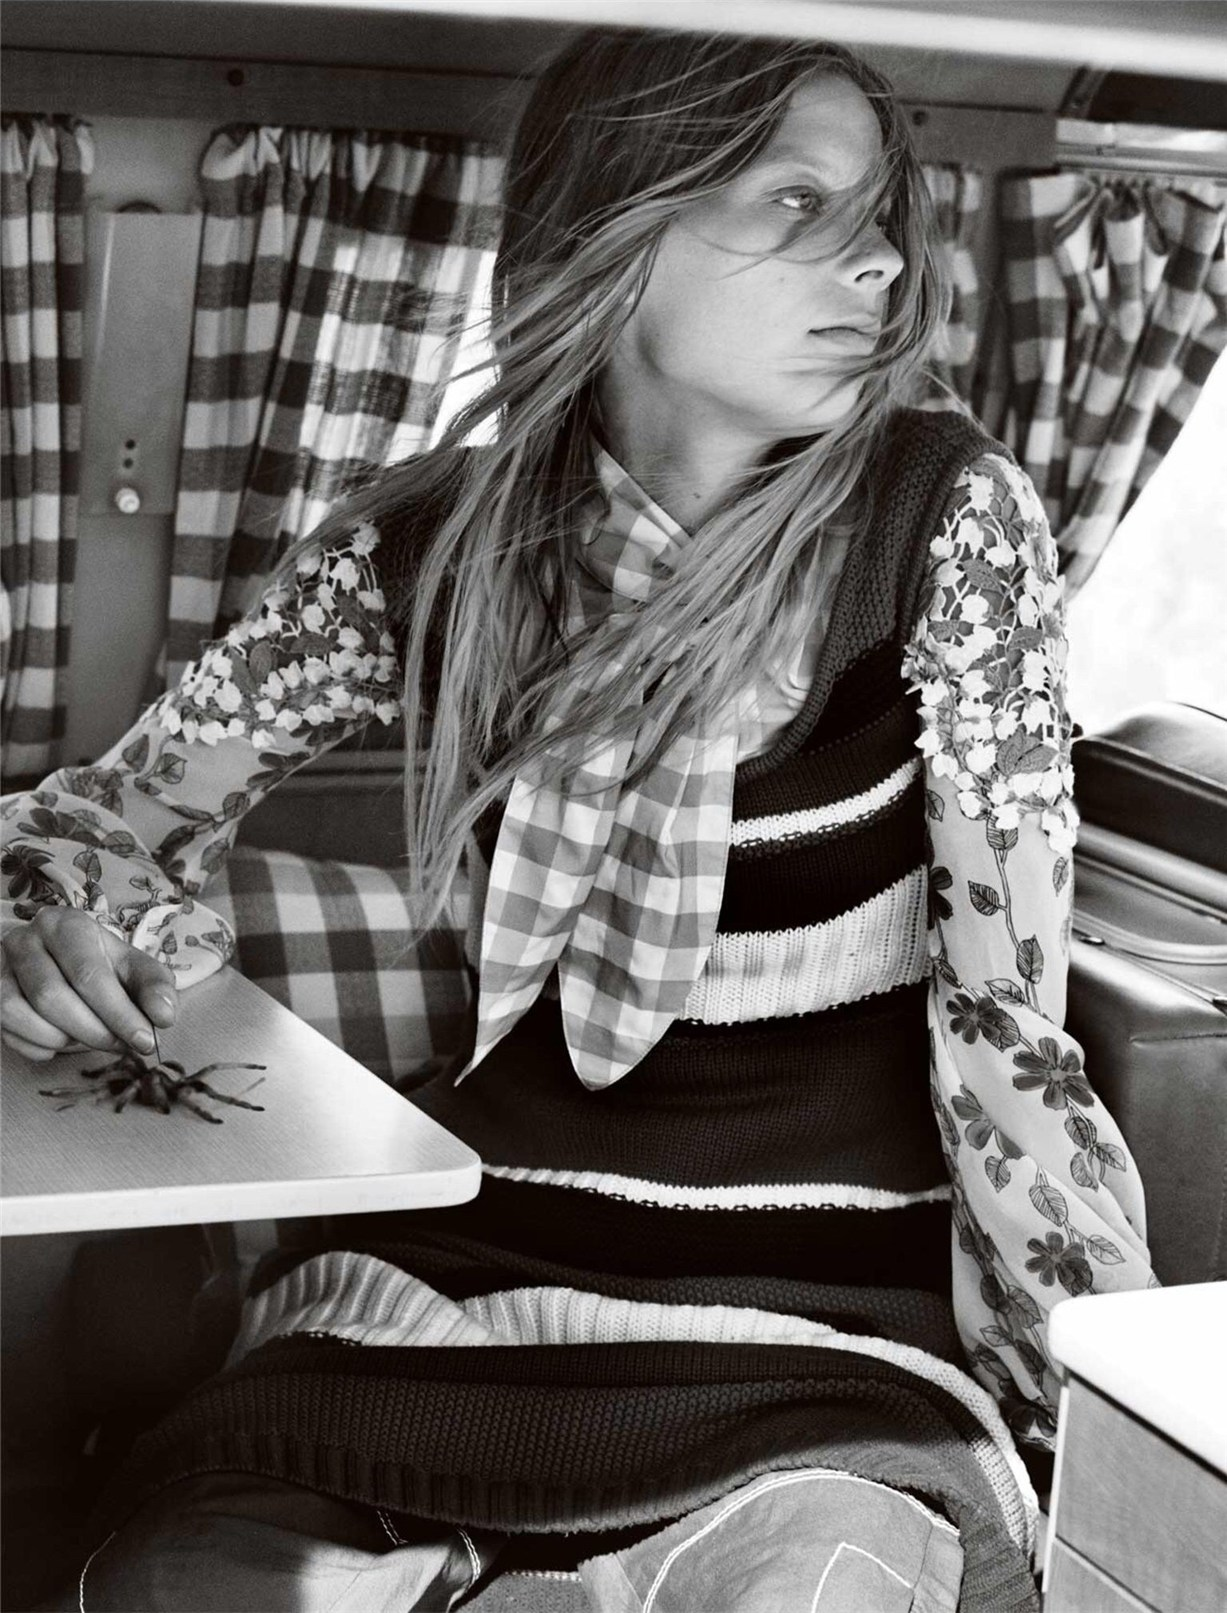 Лекси Болинг / Lexi Boling & Jay Alvarrez by Mario Testino - Vogue UK january 2017